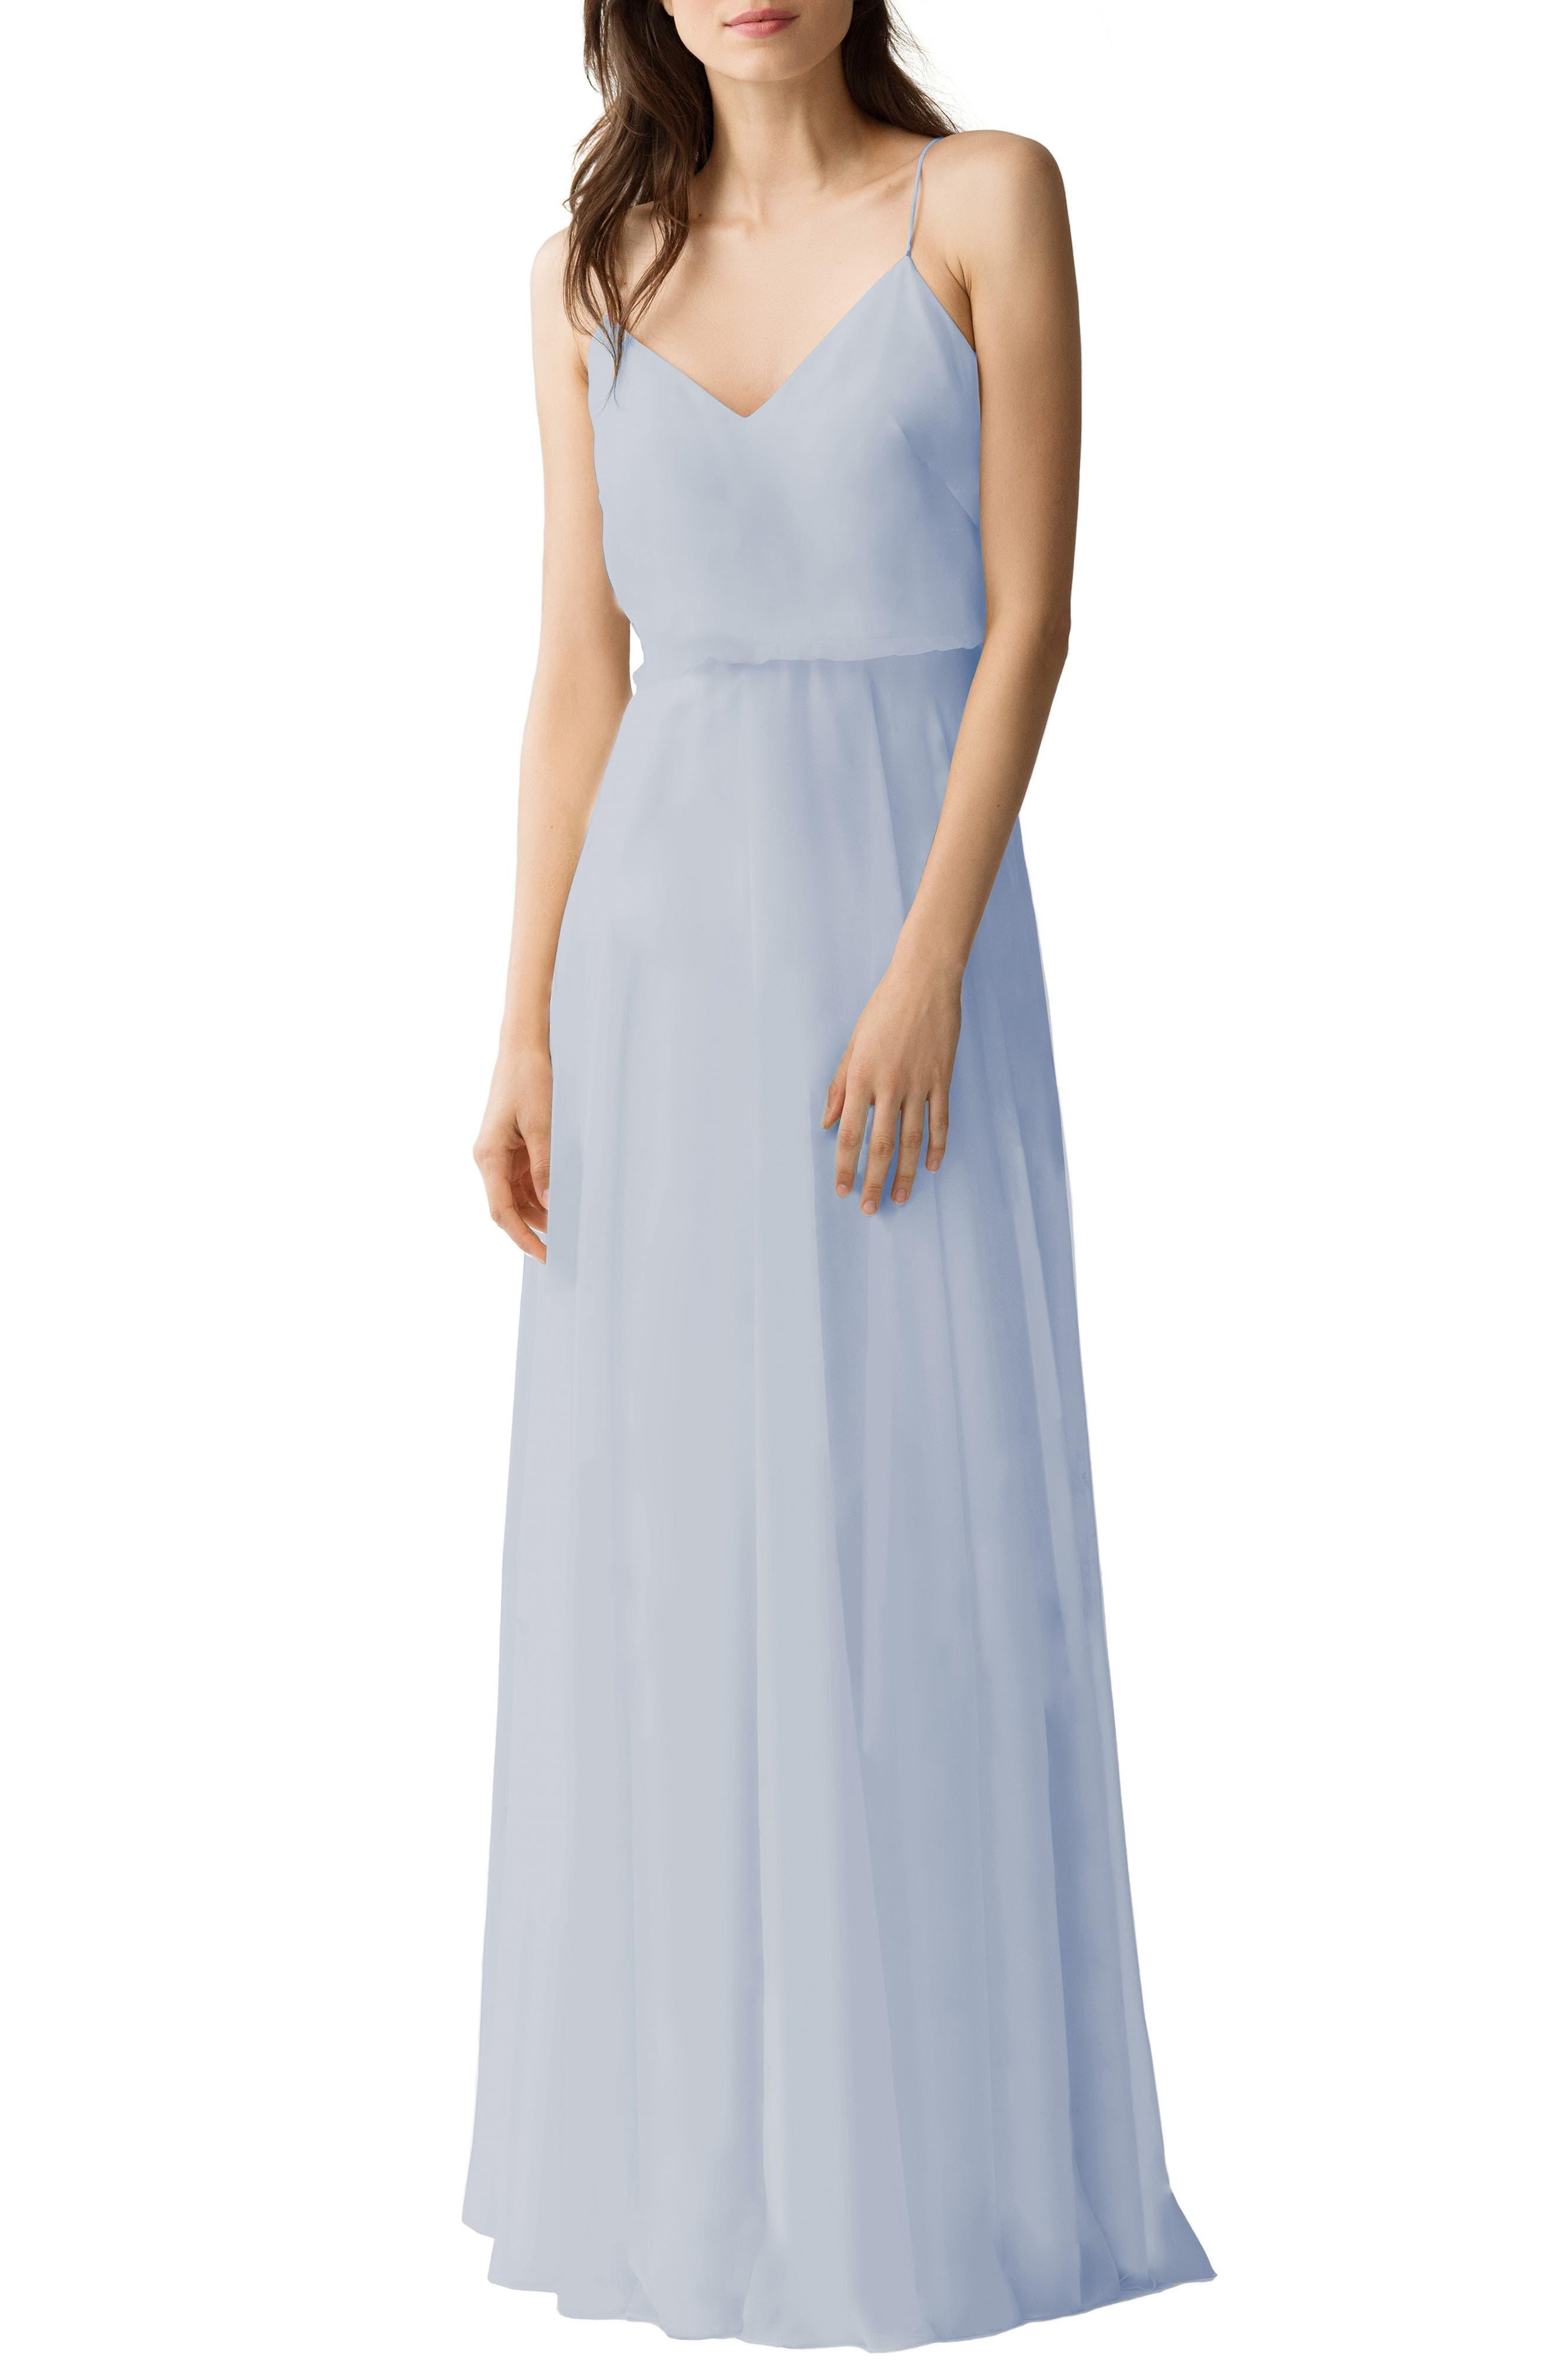 JENNY YOO Inesse Chiffon V-Neck Spaghetti Strap Gown in Whisper Blue